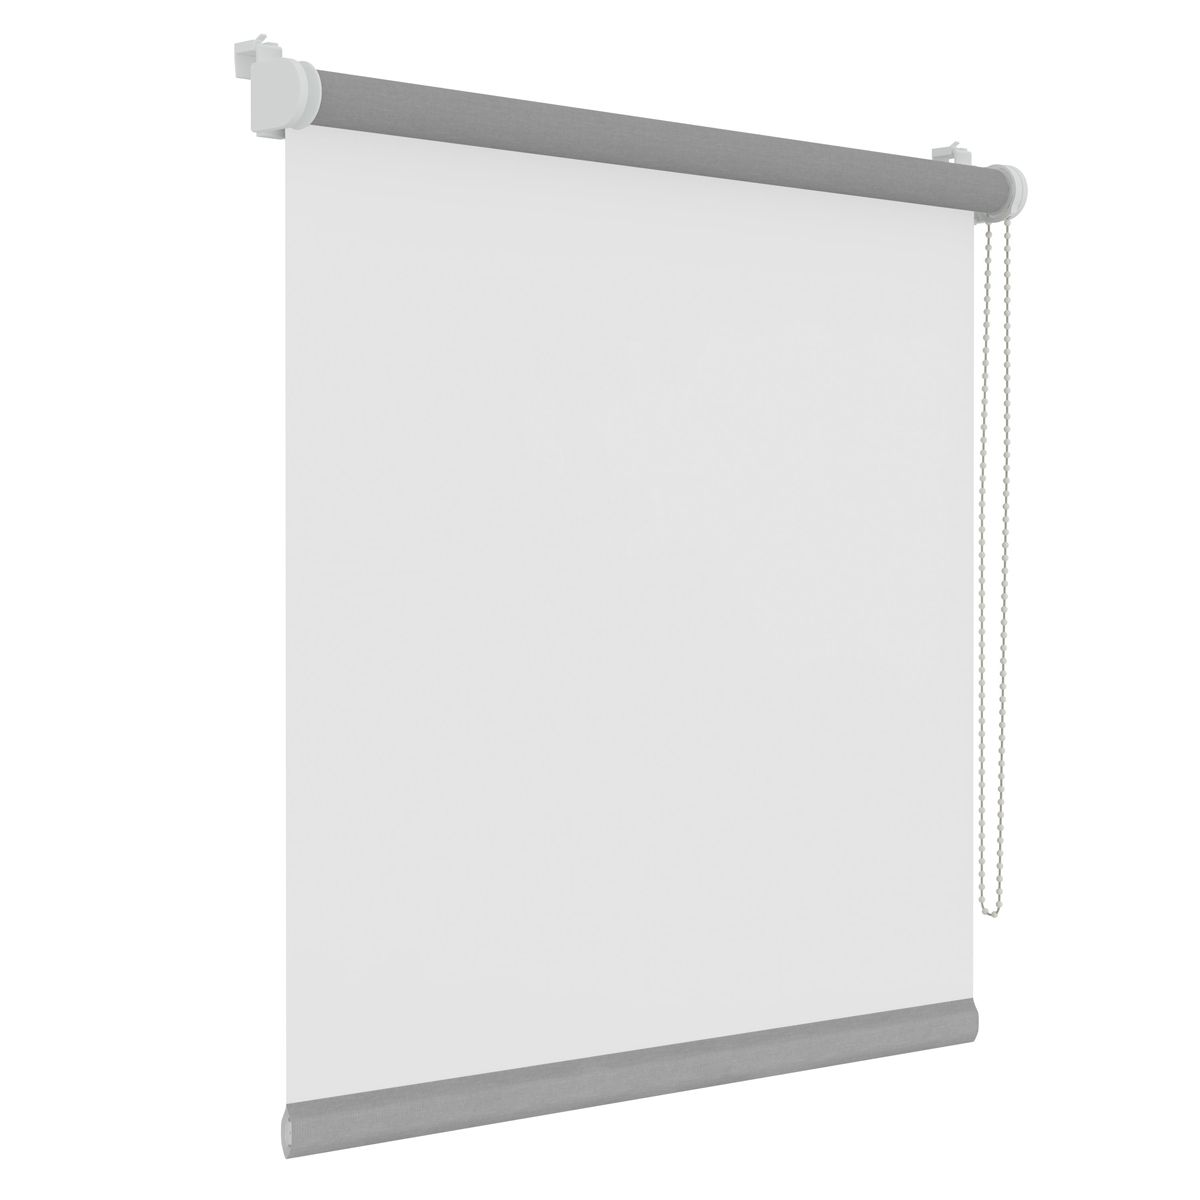 Store enrouleur tamisant blanc Myrdall 57x160 cm